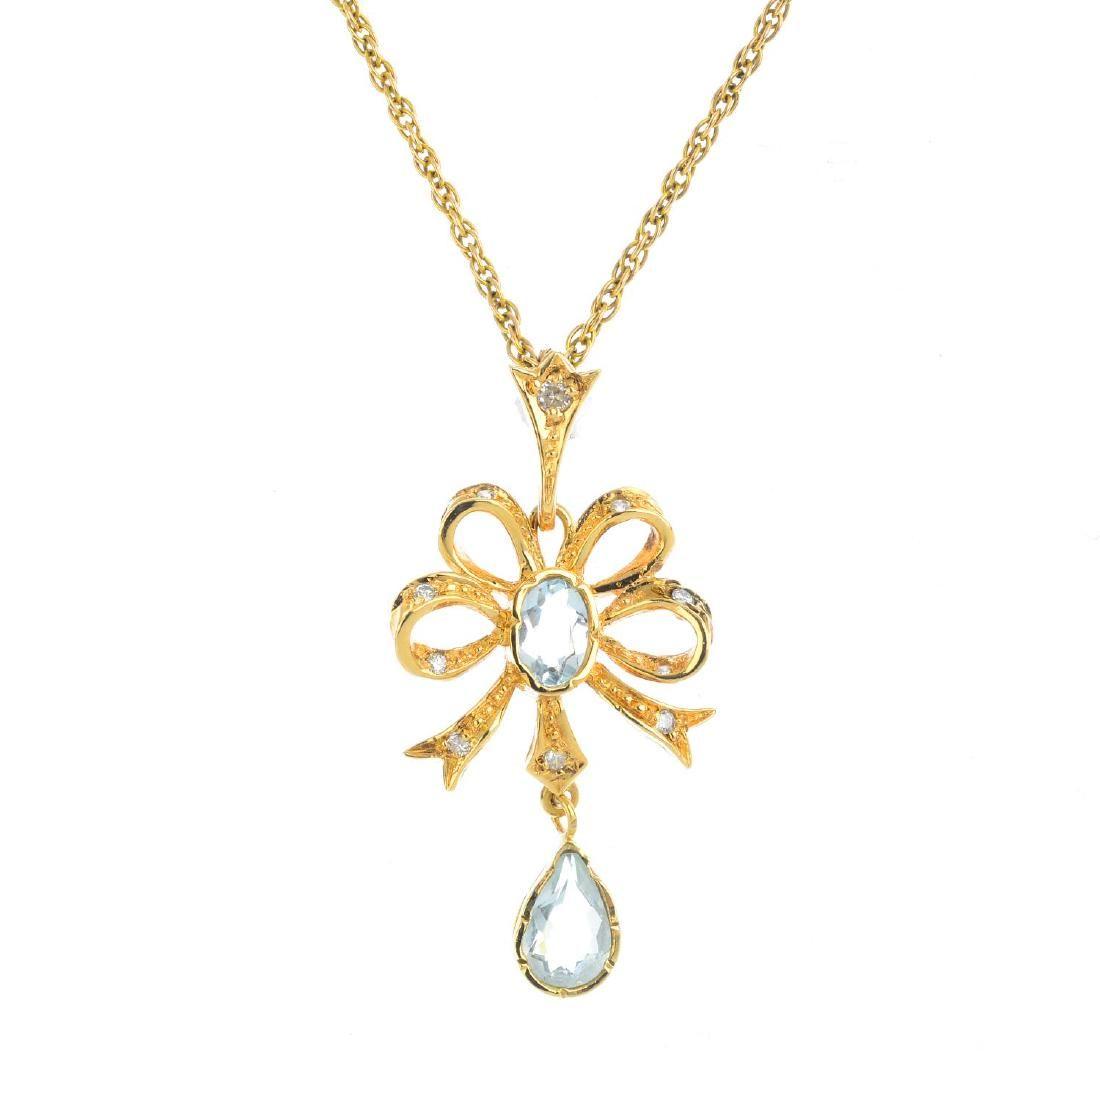 A set of 9ct gold aquamarine and diamond jewellery. To